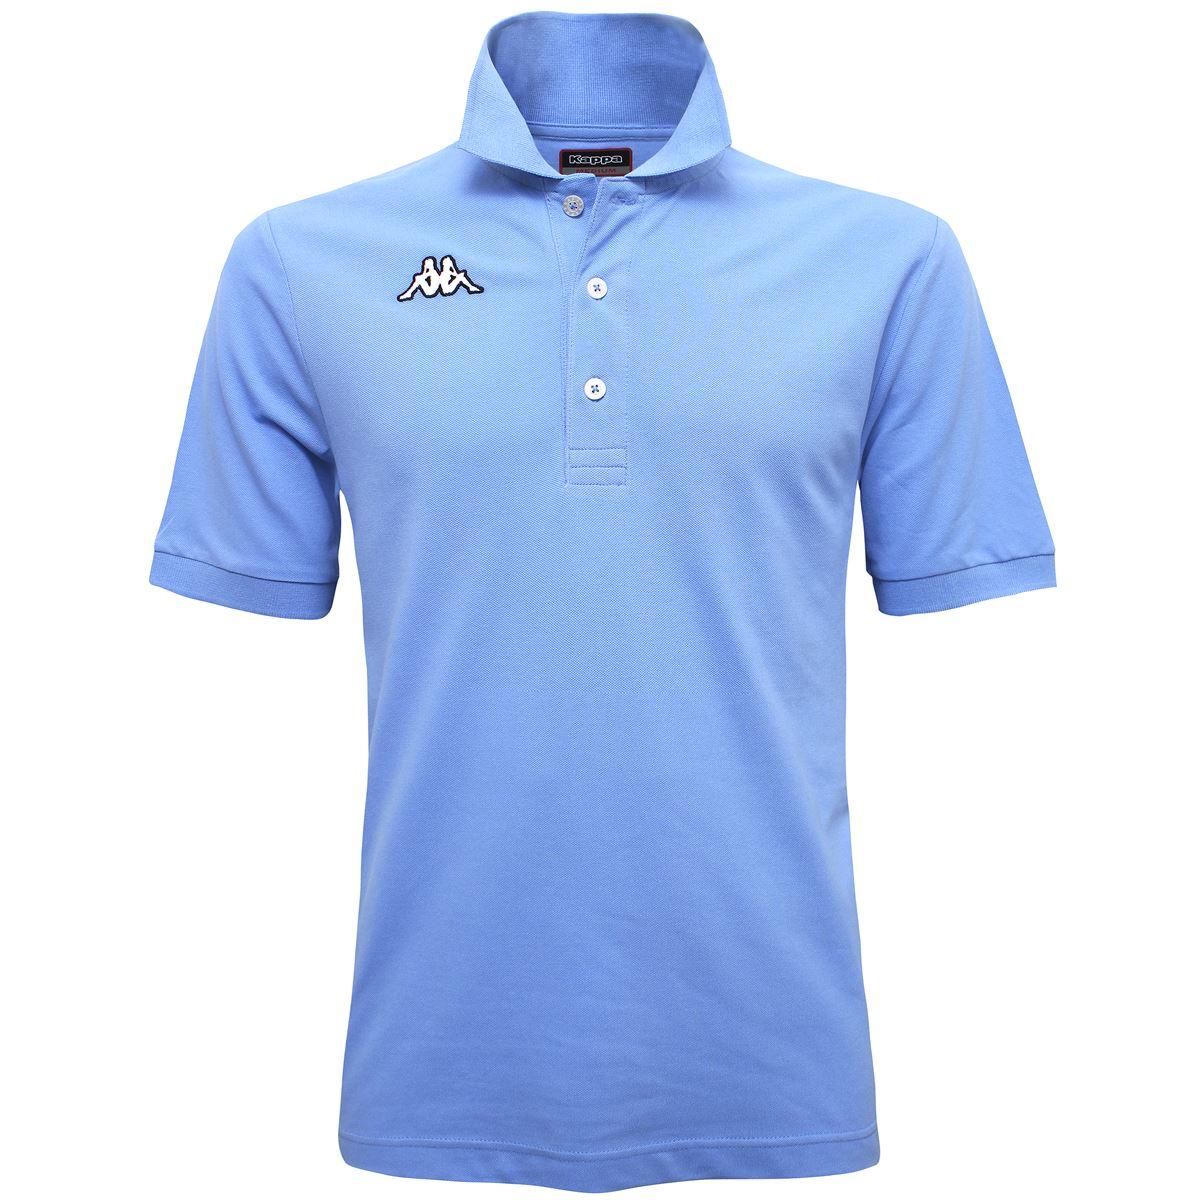 Kappa Polo Shirts uomo-302B3D0